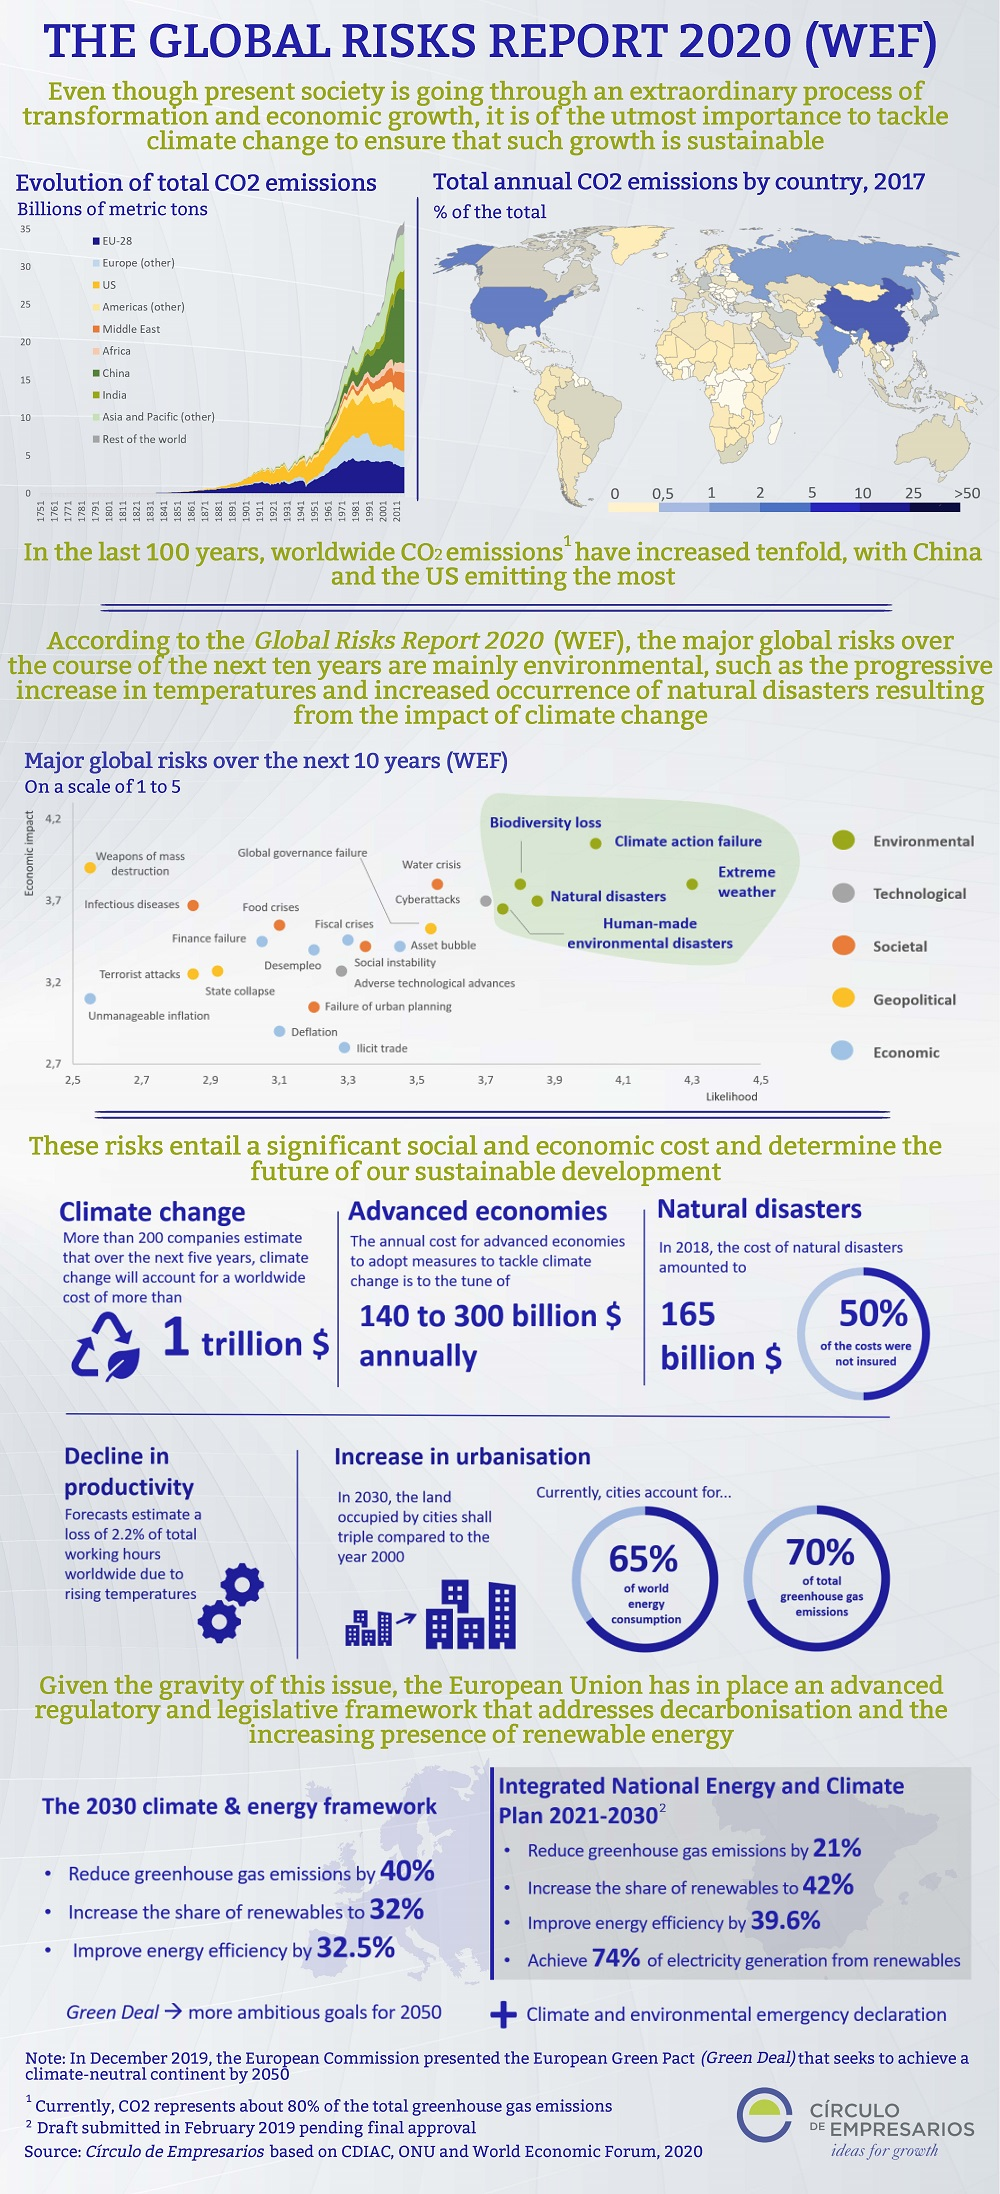 The-Global-Risks-Report-2020-english-January-2020-Circulo-de-Empresarios